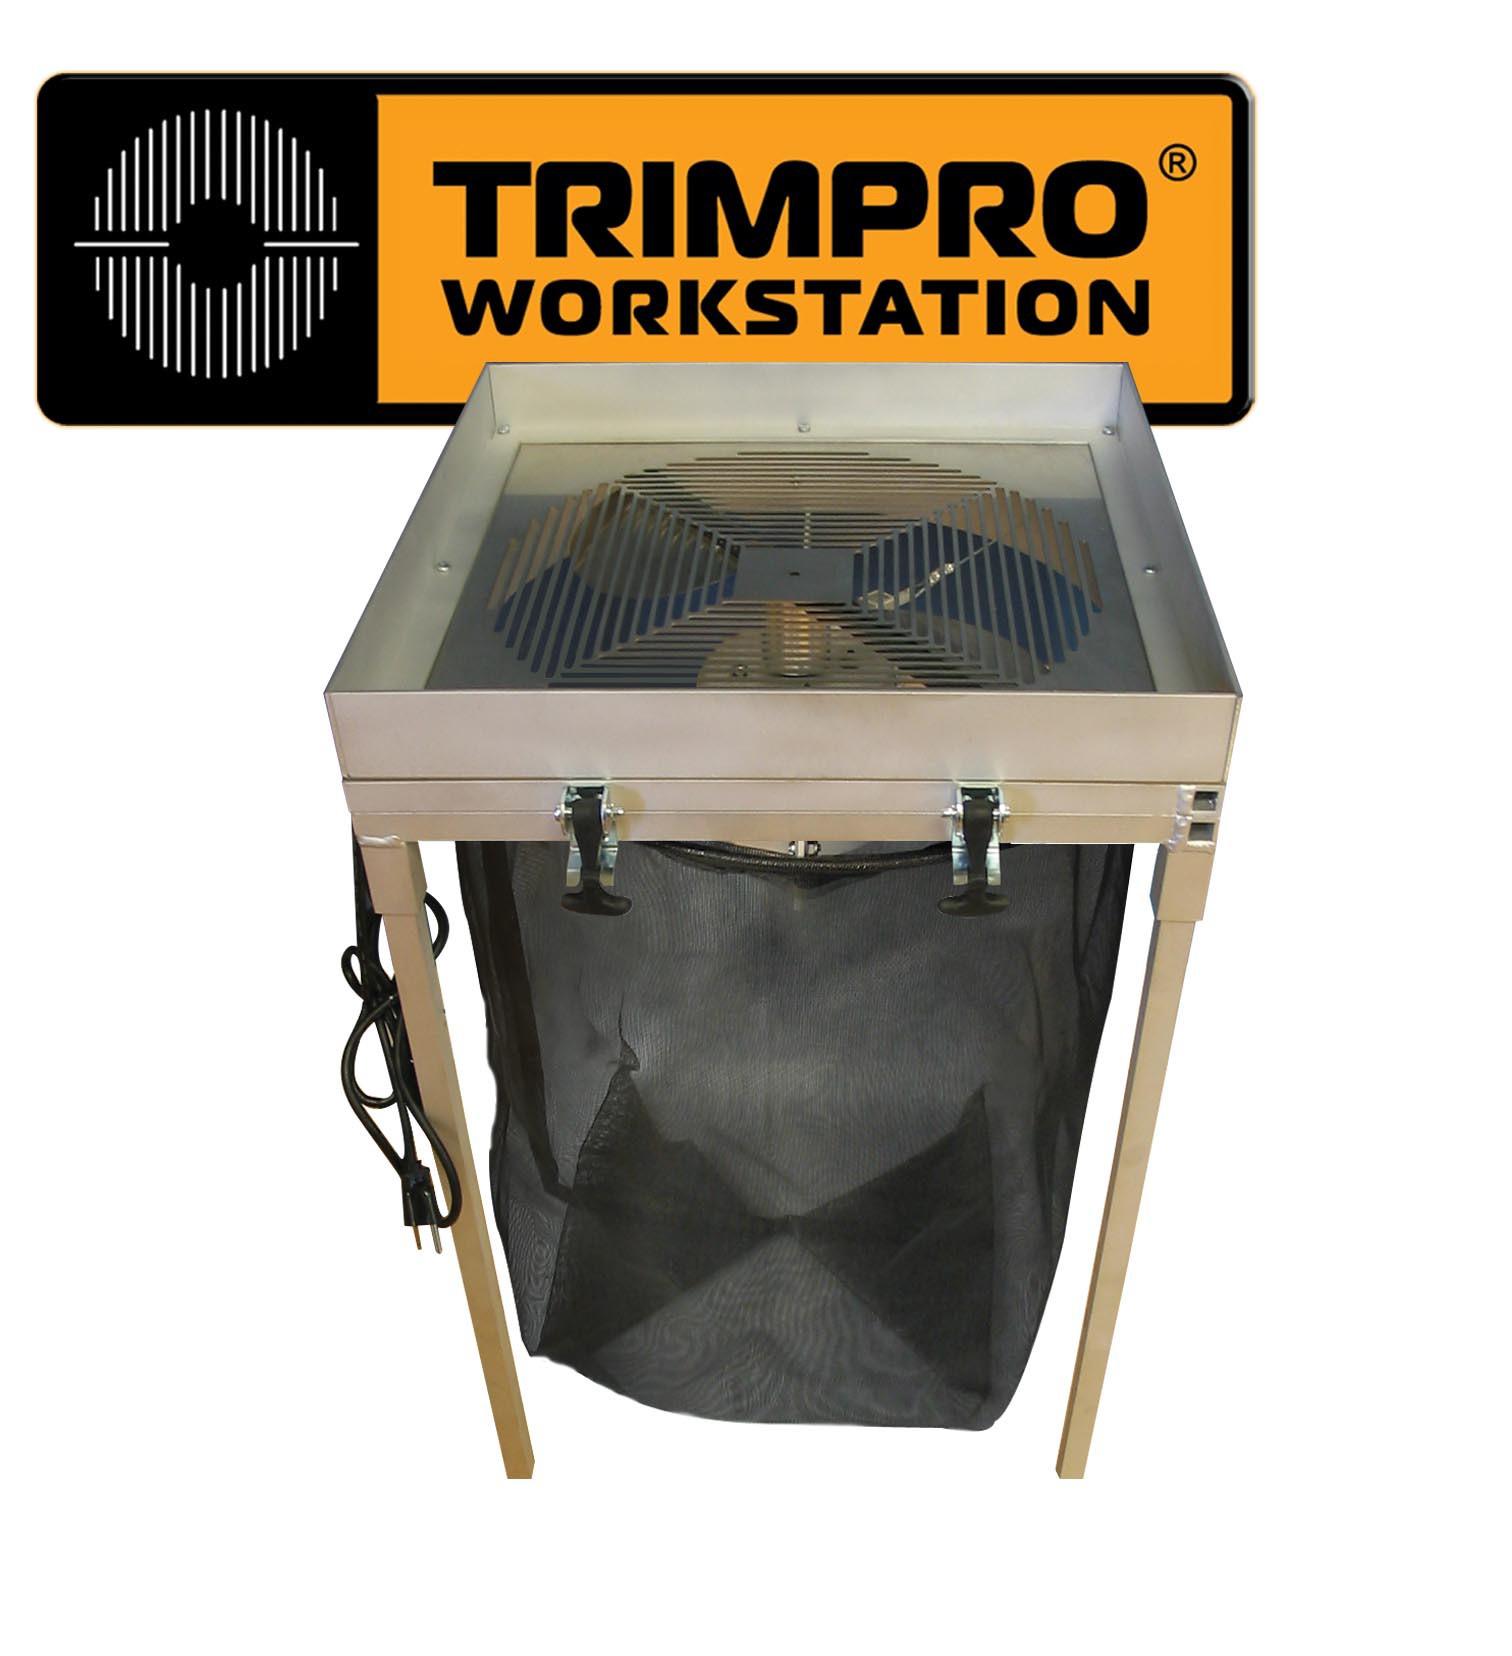 Máquina Peladora Trimpro WorkStation manicurar cogollos 1